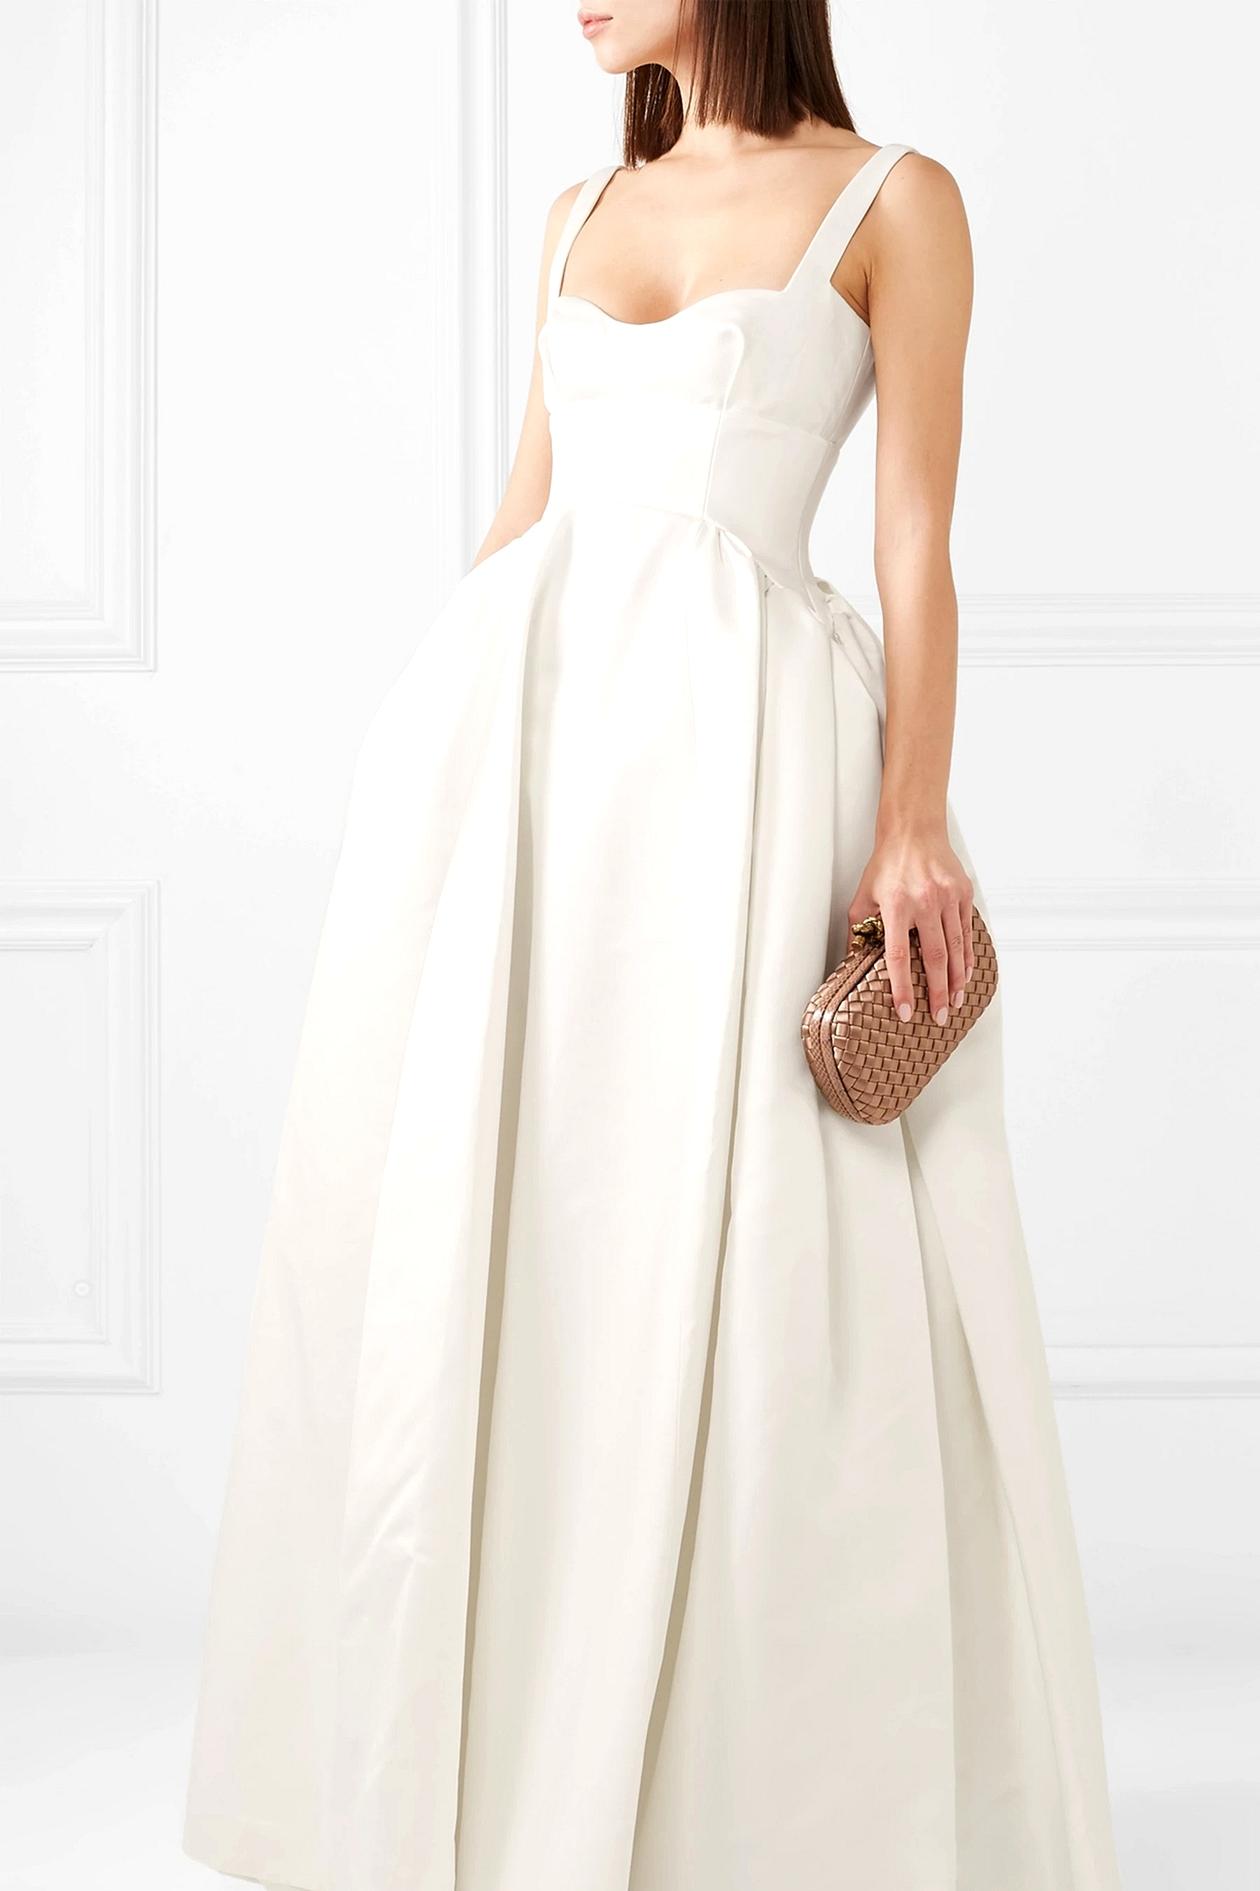 Regencycore Wedding Dress